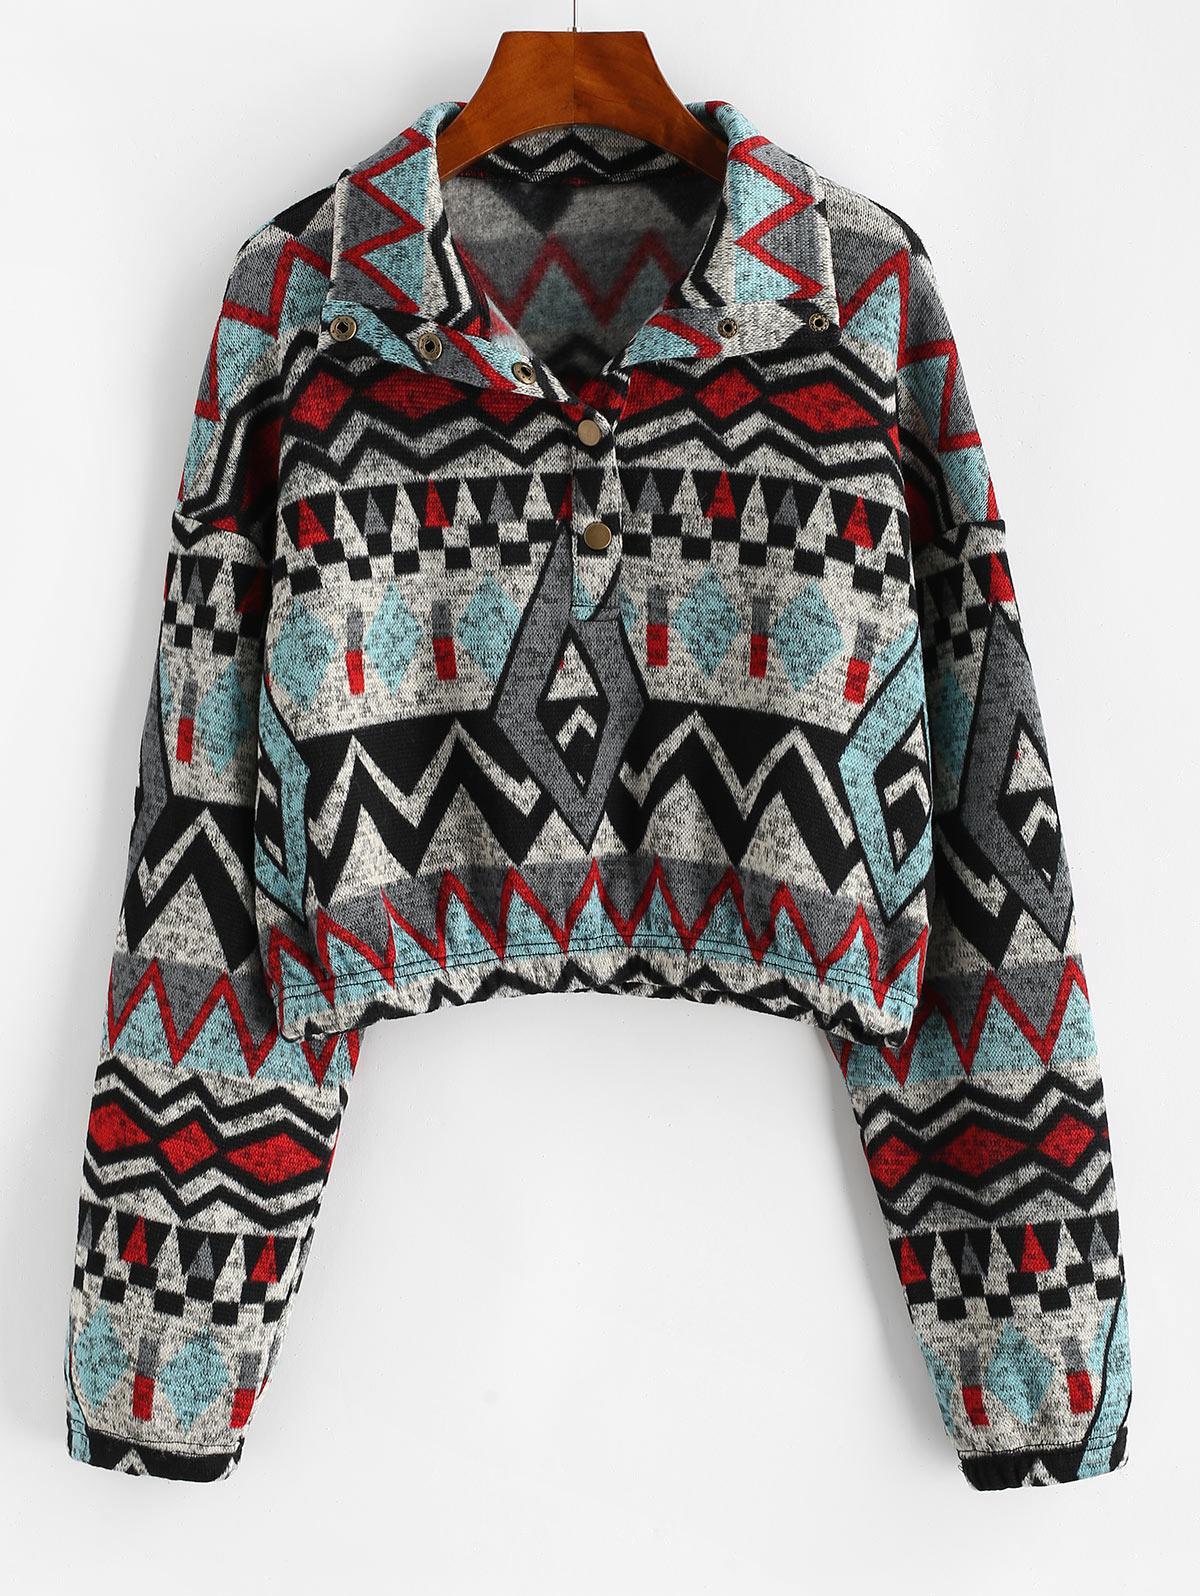 ZAFUL Drop Shoulder Snap Button Tribal Print Sweatshirt  - buy with discount